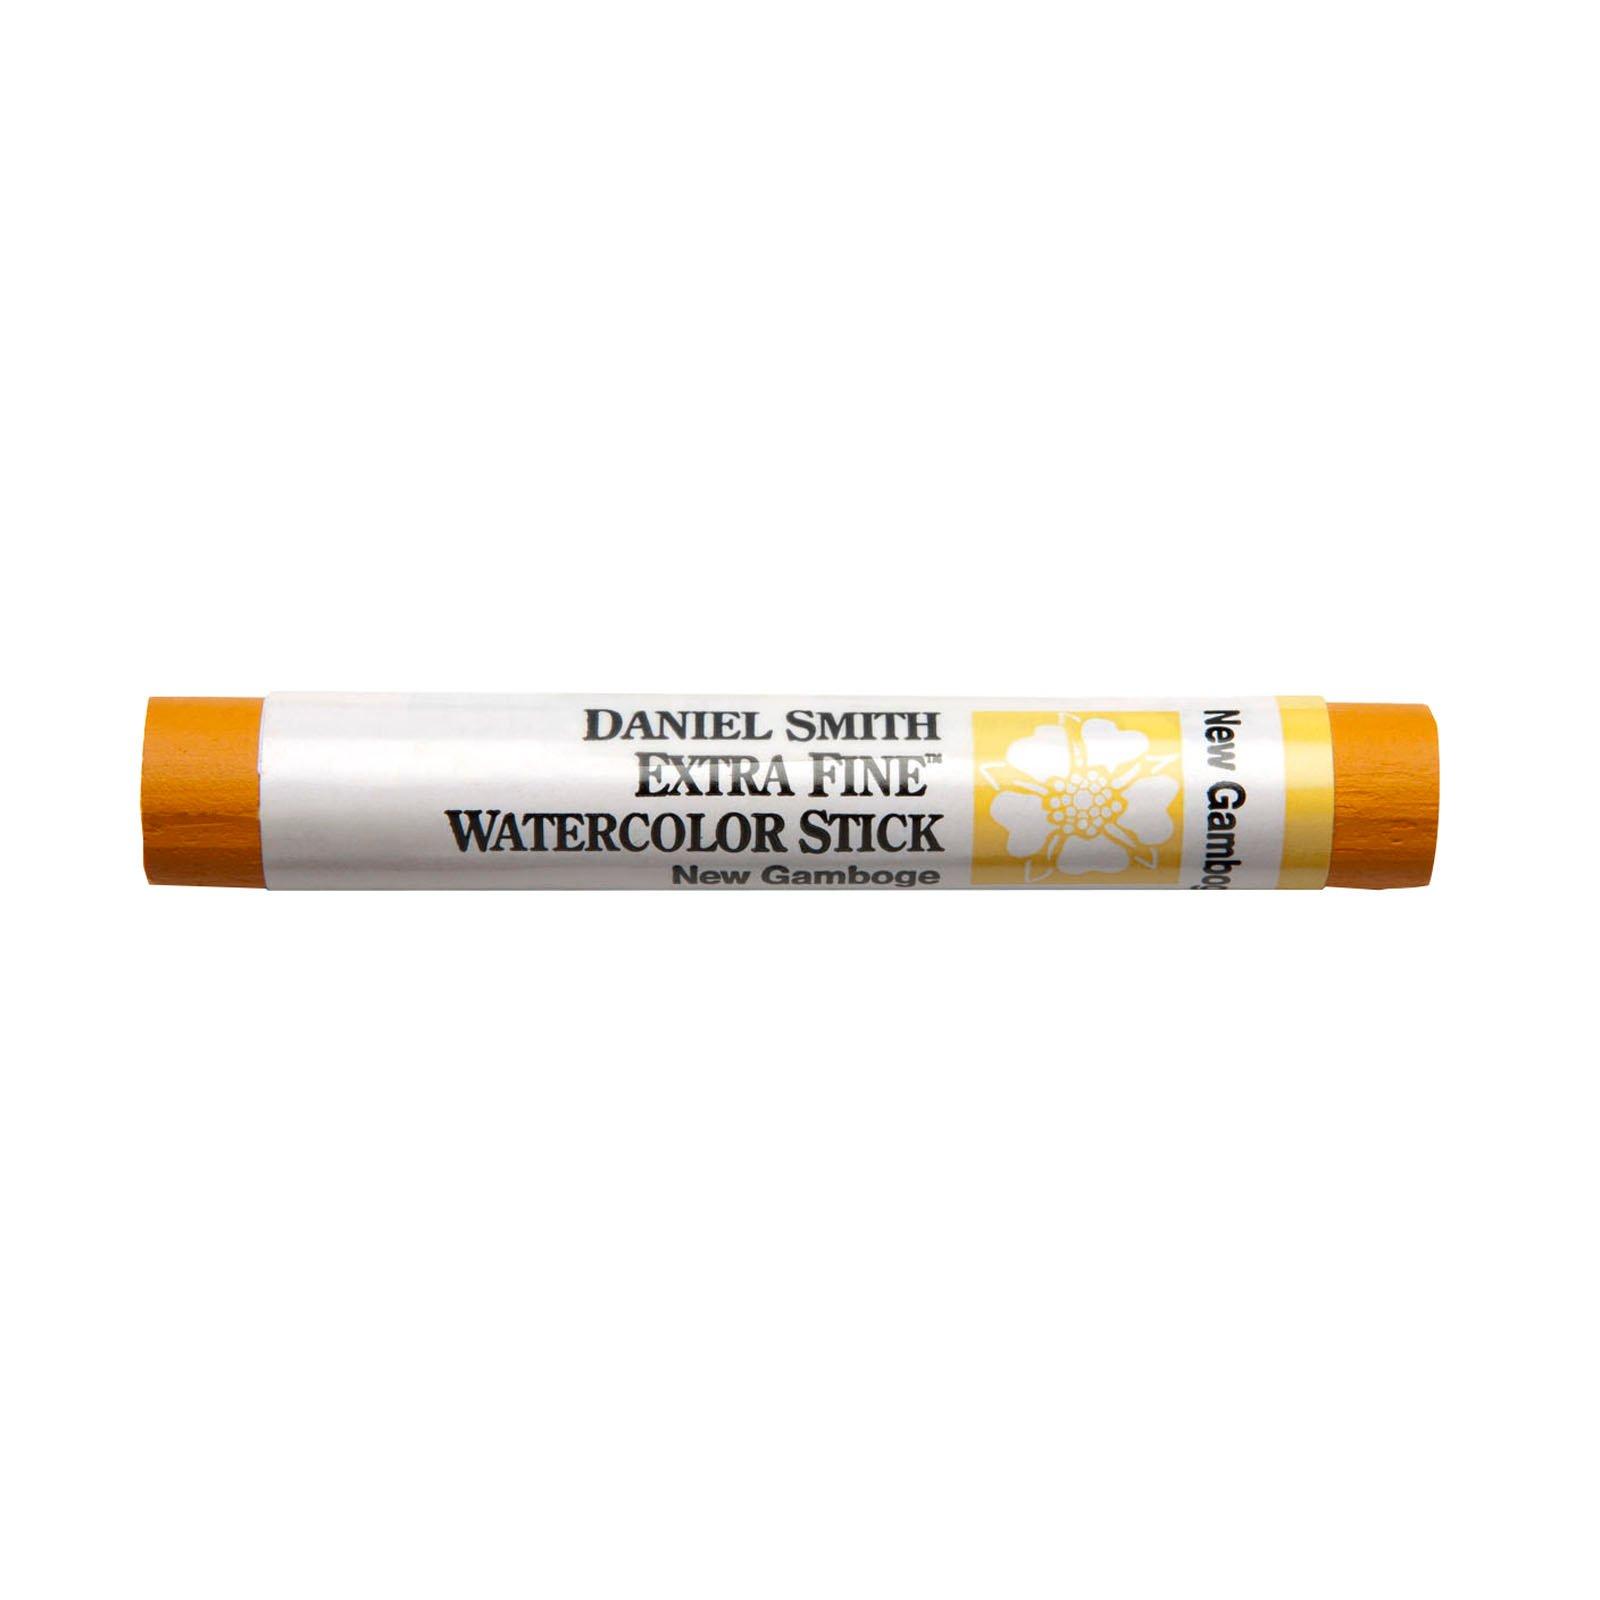 Extra-Fine Watercolor Sticks, New Gamboge - 12ml Stick